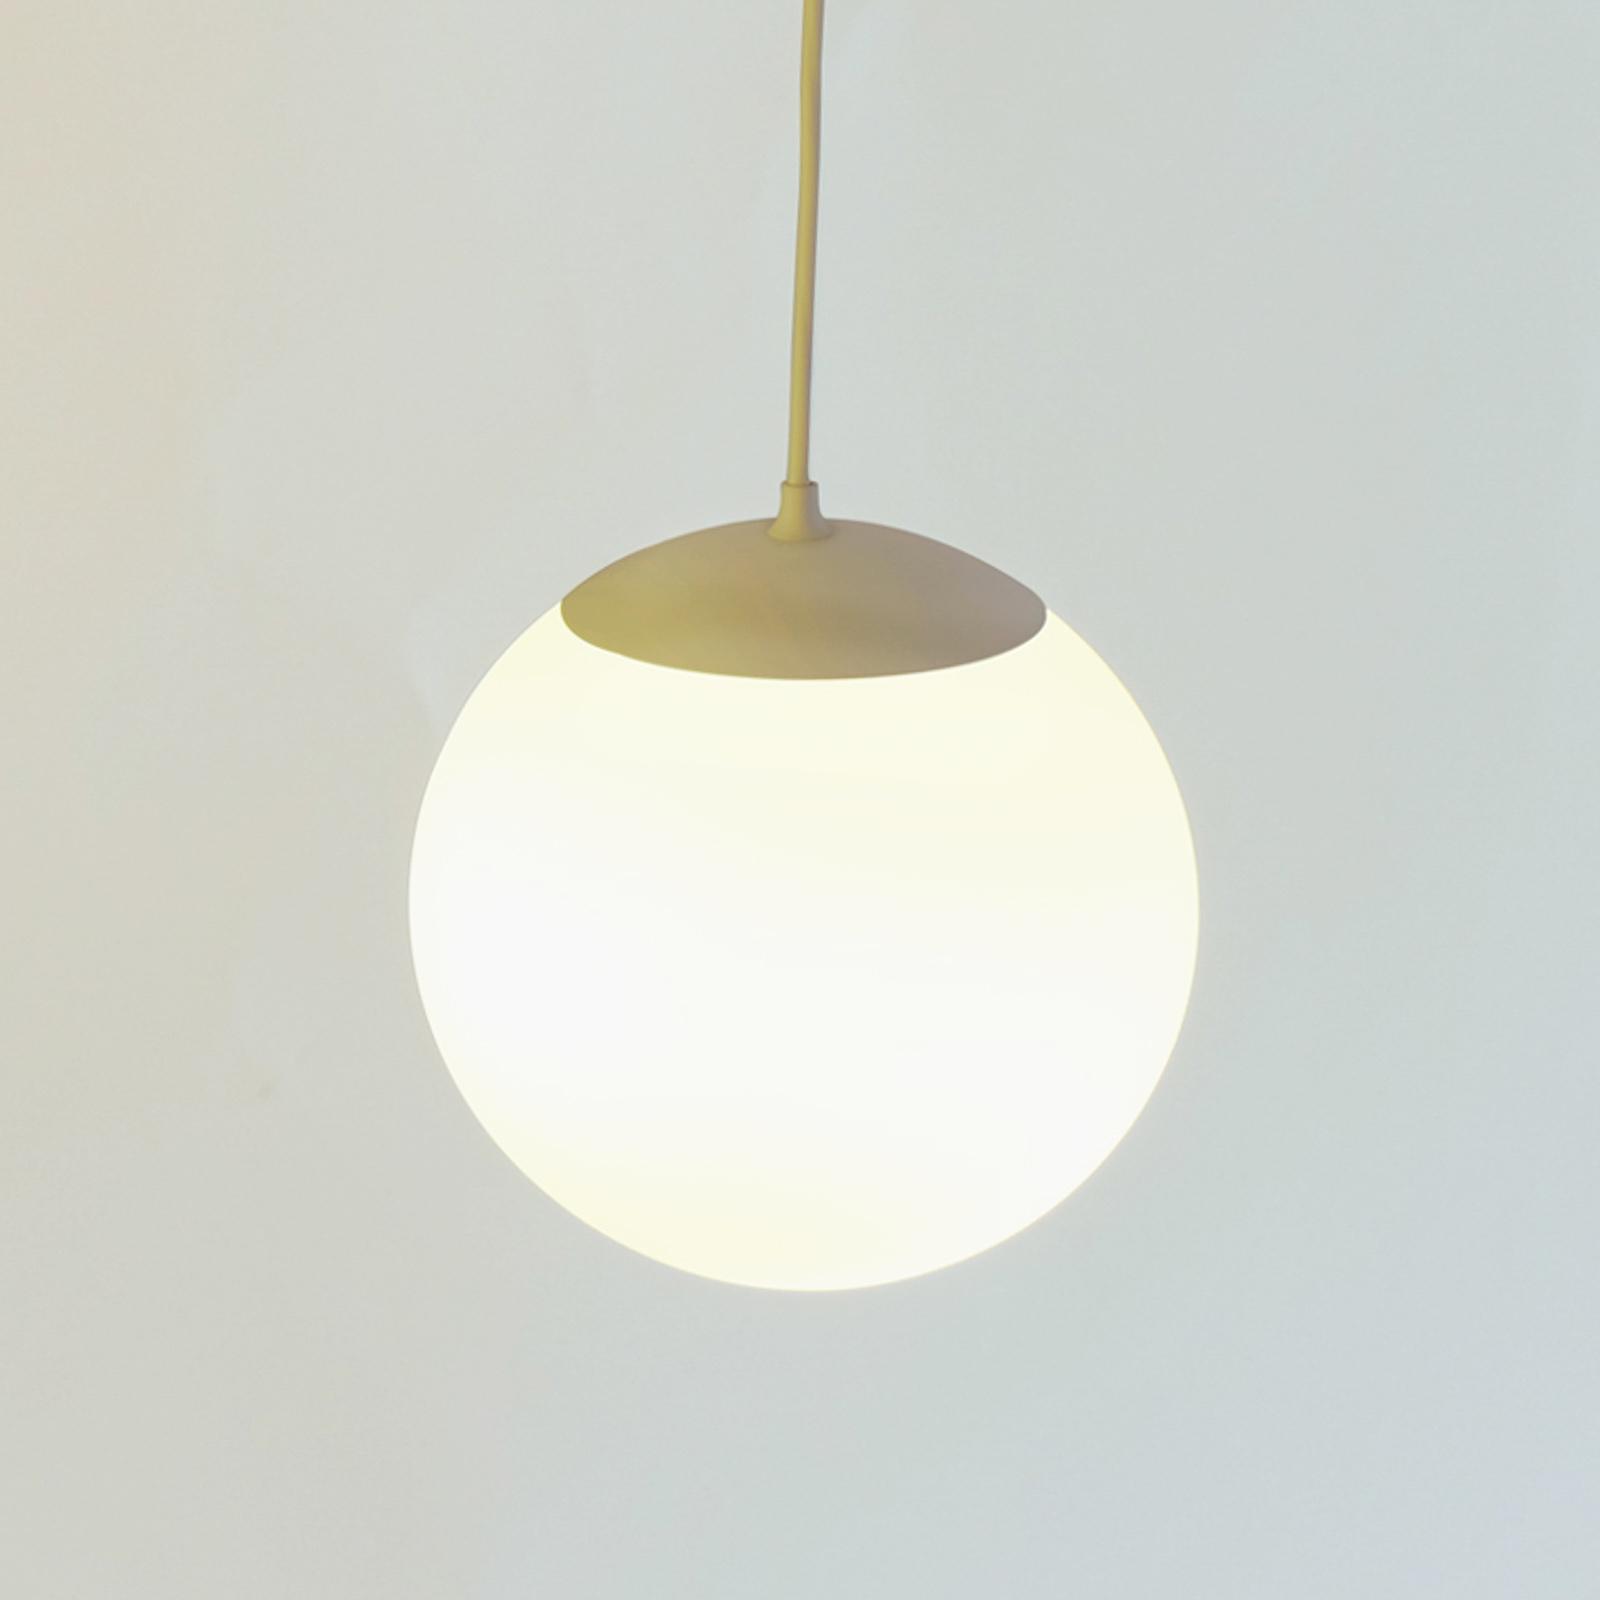 Innermost Drop lampa wisząca, mosiądz, Ø 20 cm